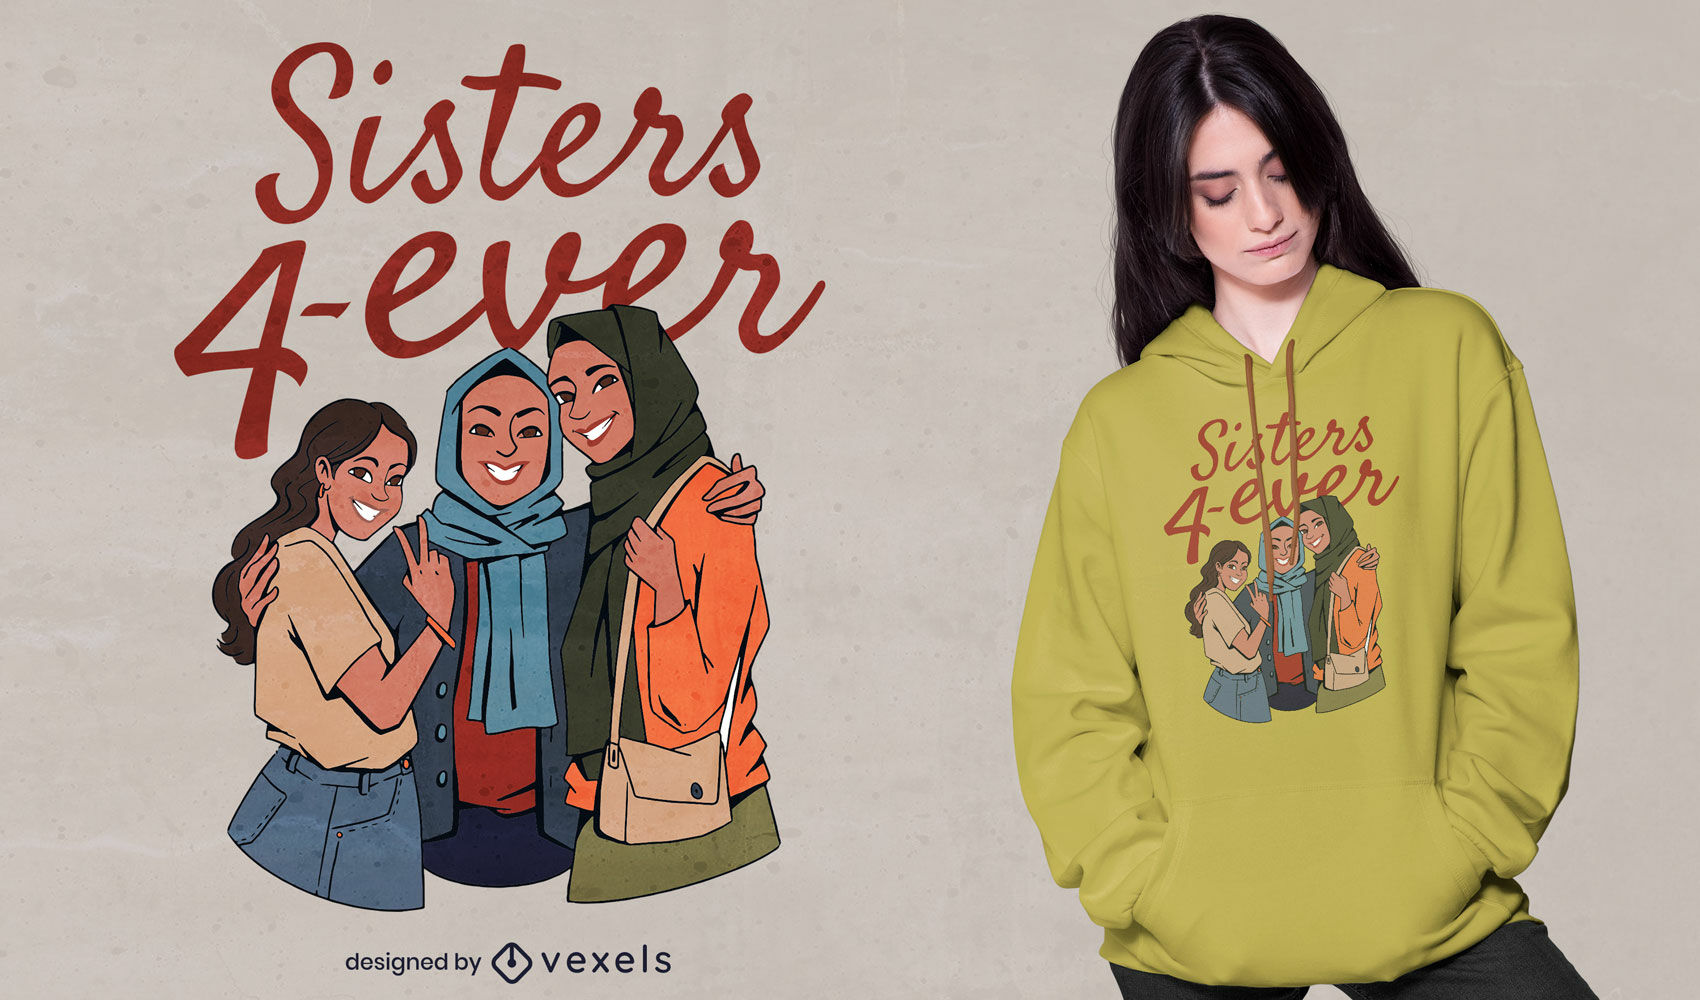 Hijab sisters 4 ever t-shirt design